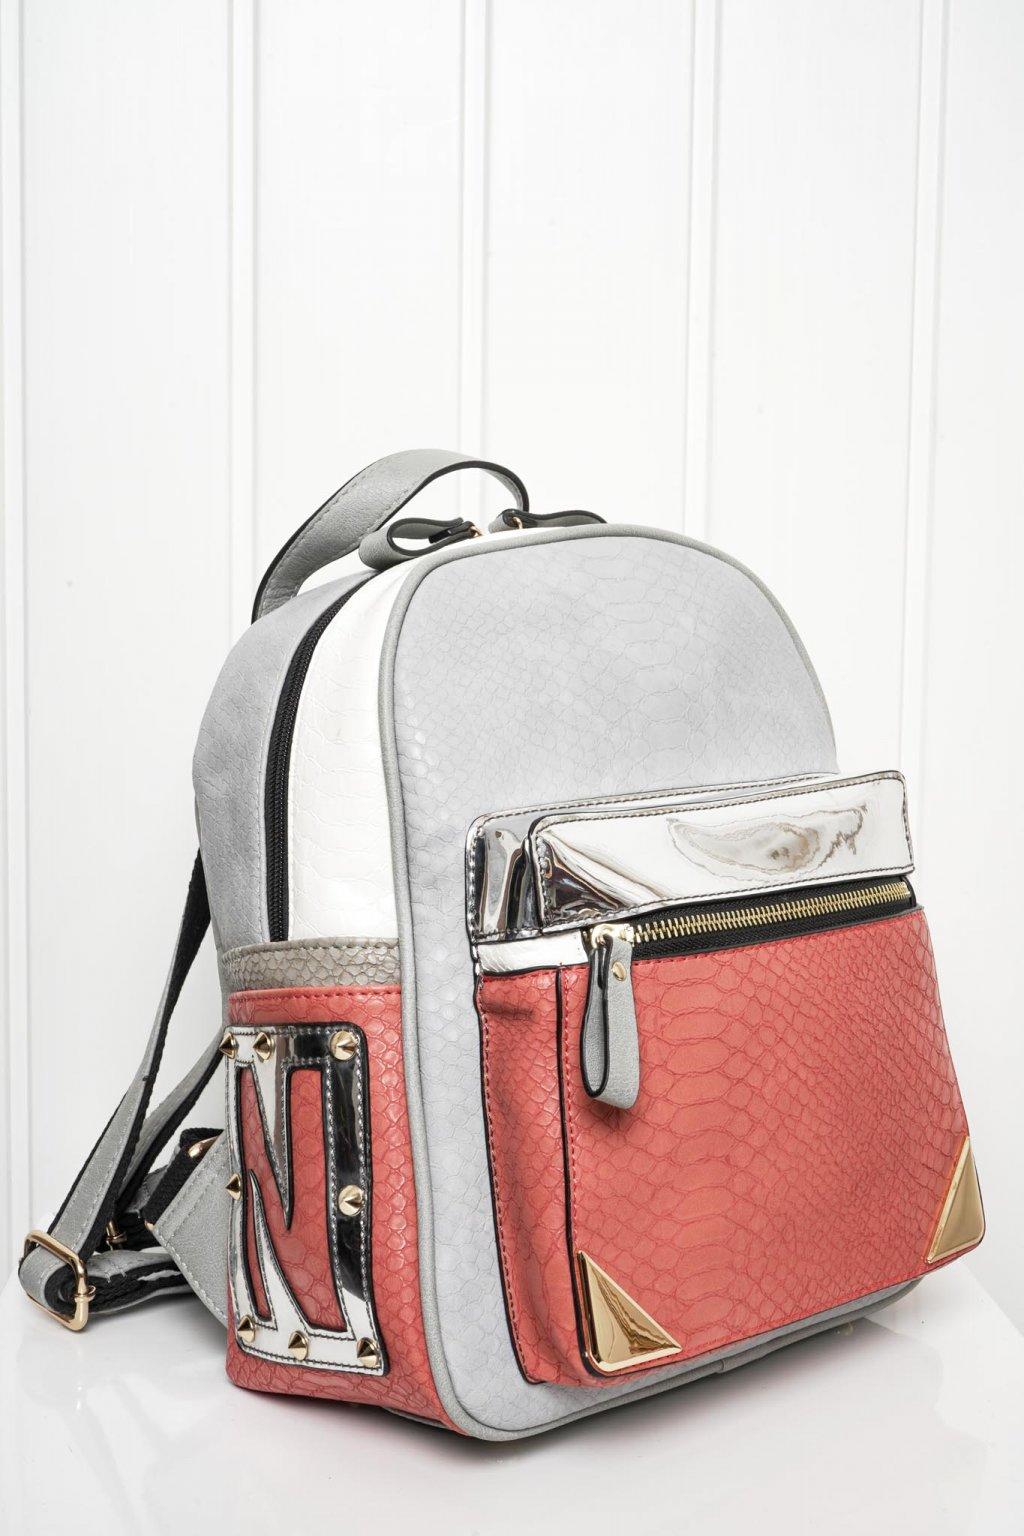 Kabelka, crossbody, ruksak, shopping bag, shopperka, 469